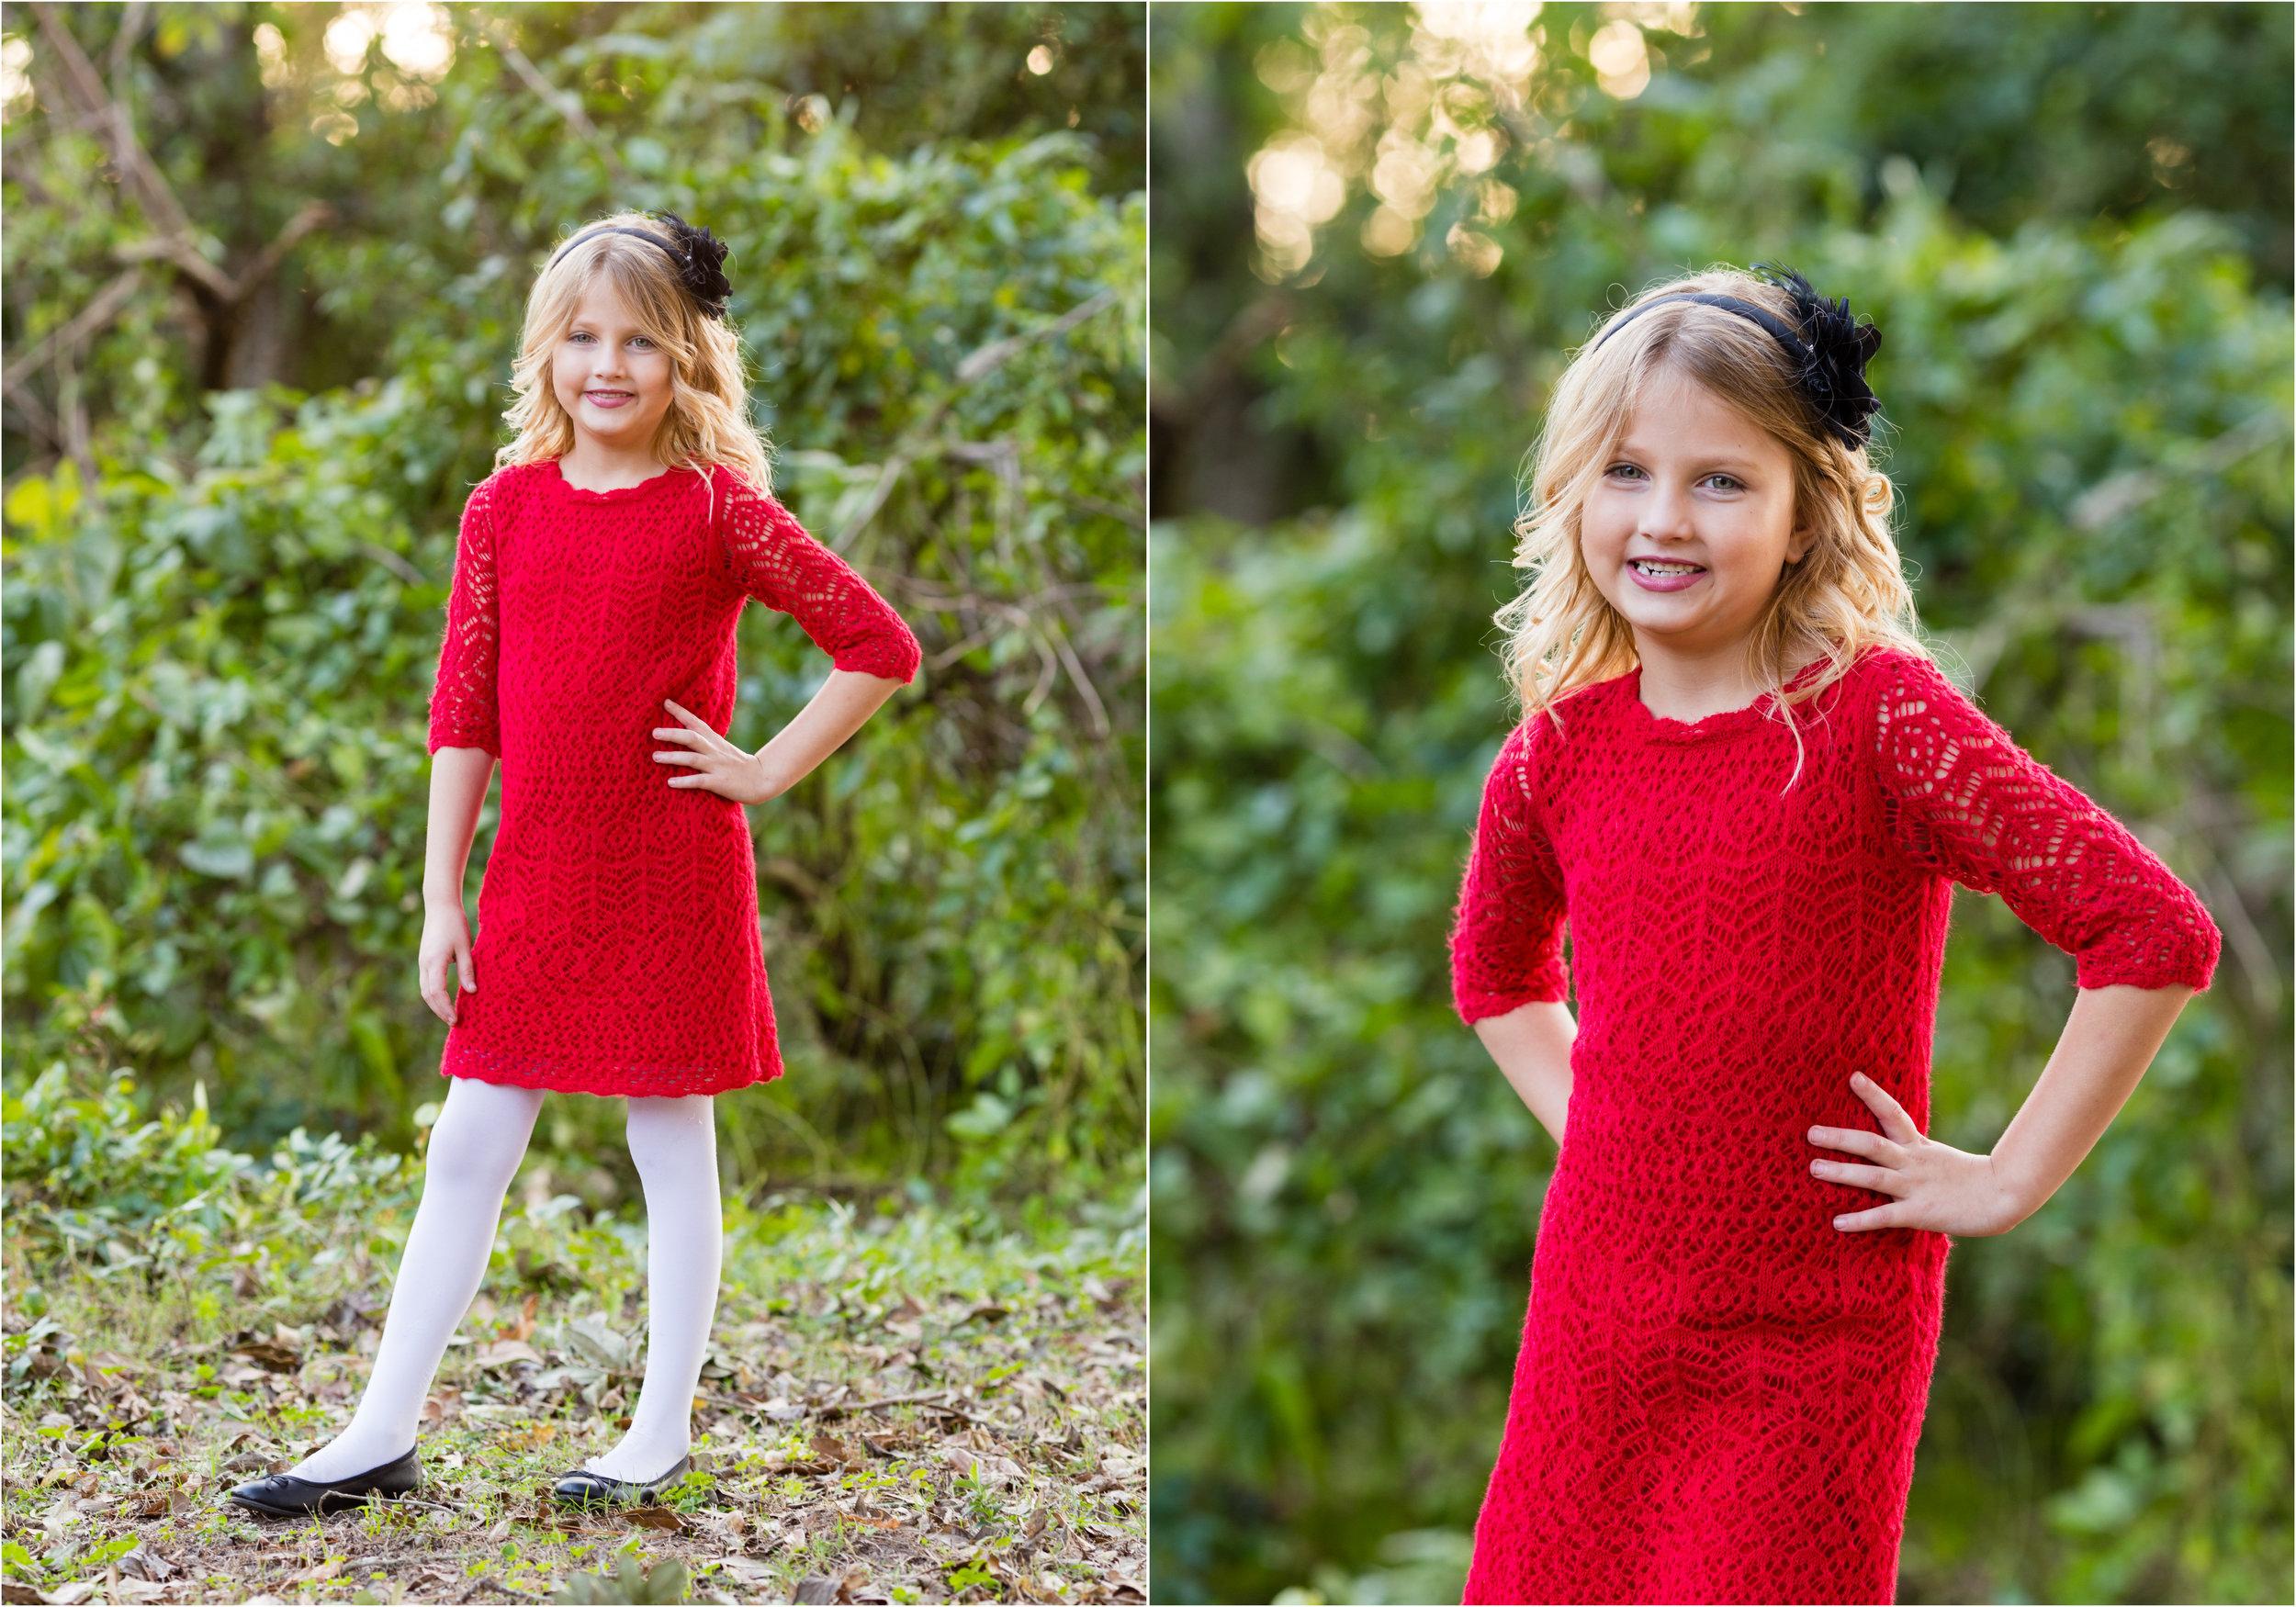 Family-child-portrait-lafayette-broussard-youngsville-photographer-b.jpg